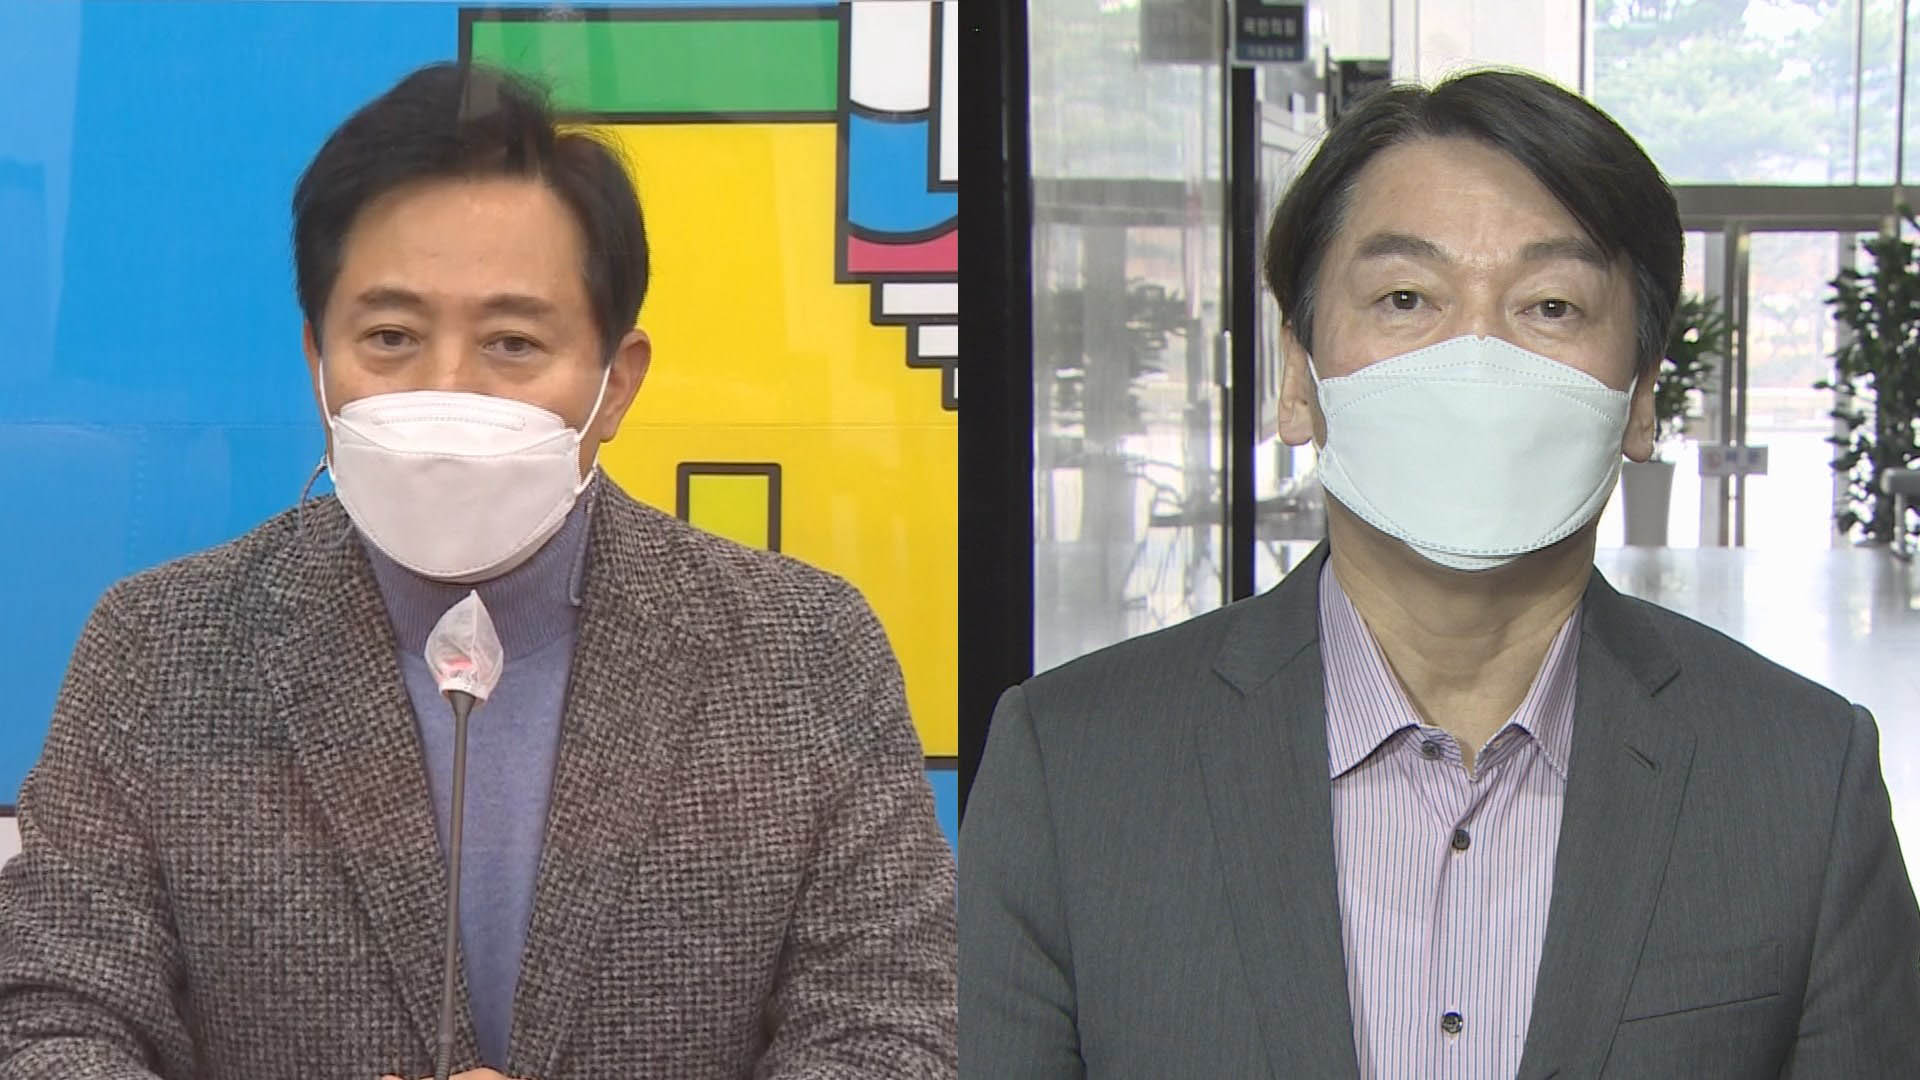 LH 투기의혹 논란 확산…오세훈·안철수 단일화 회동